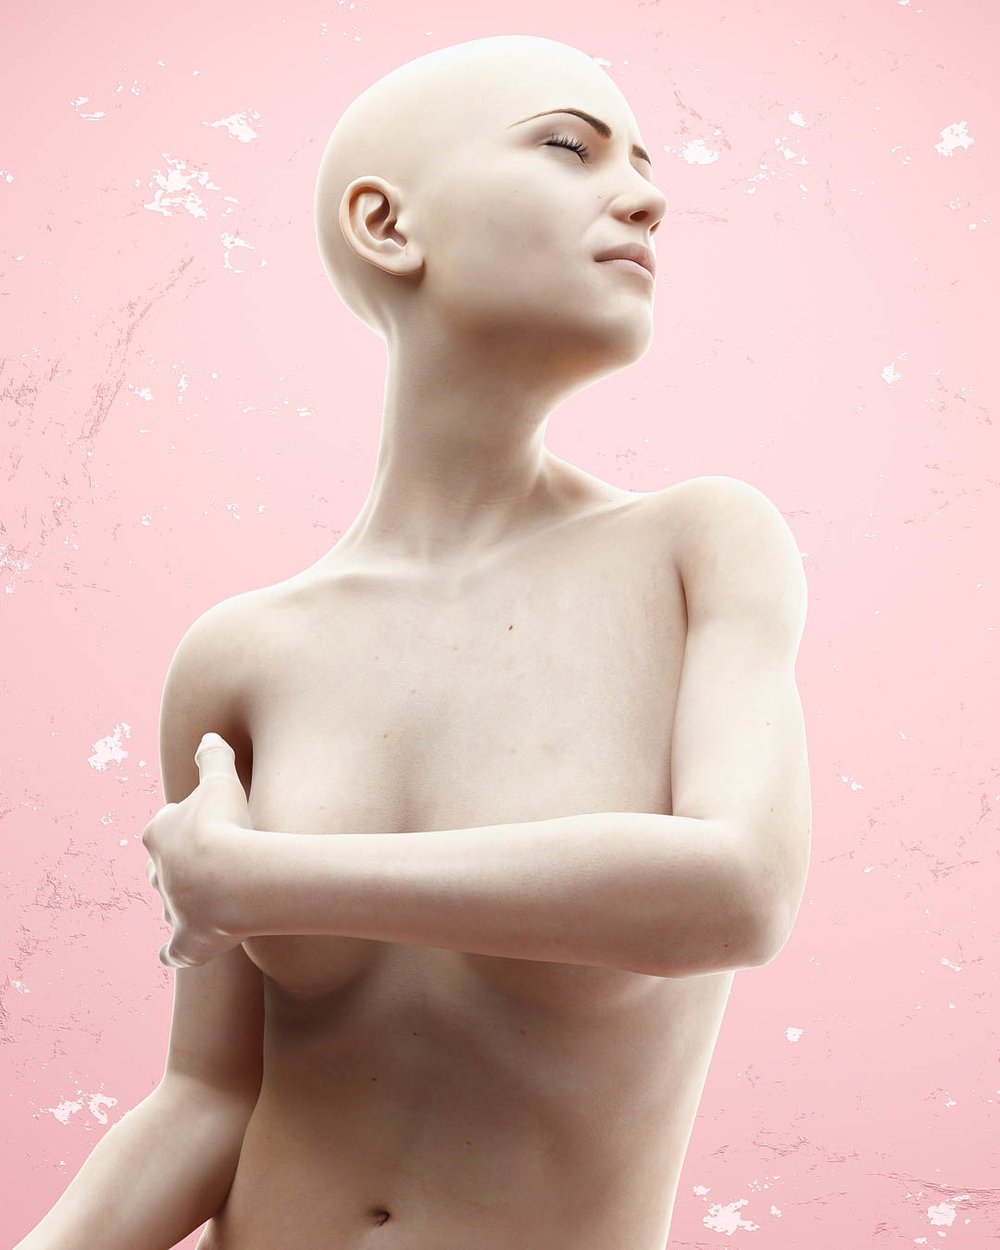 [20-03-18] - Pink.jpg